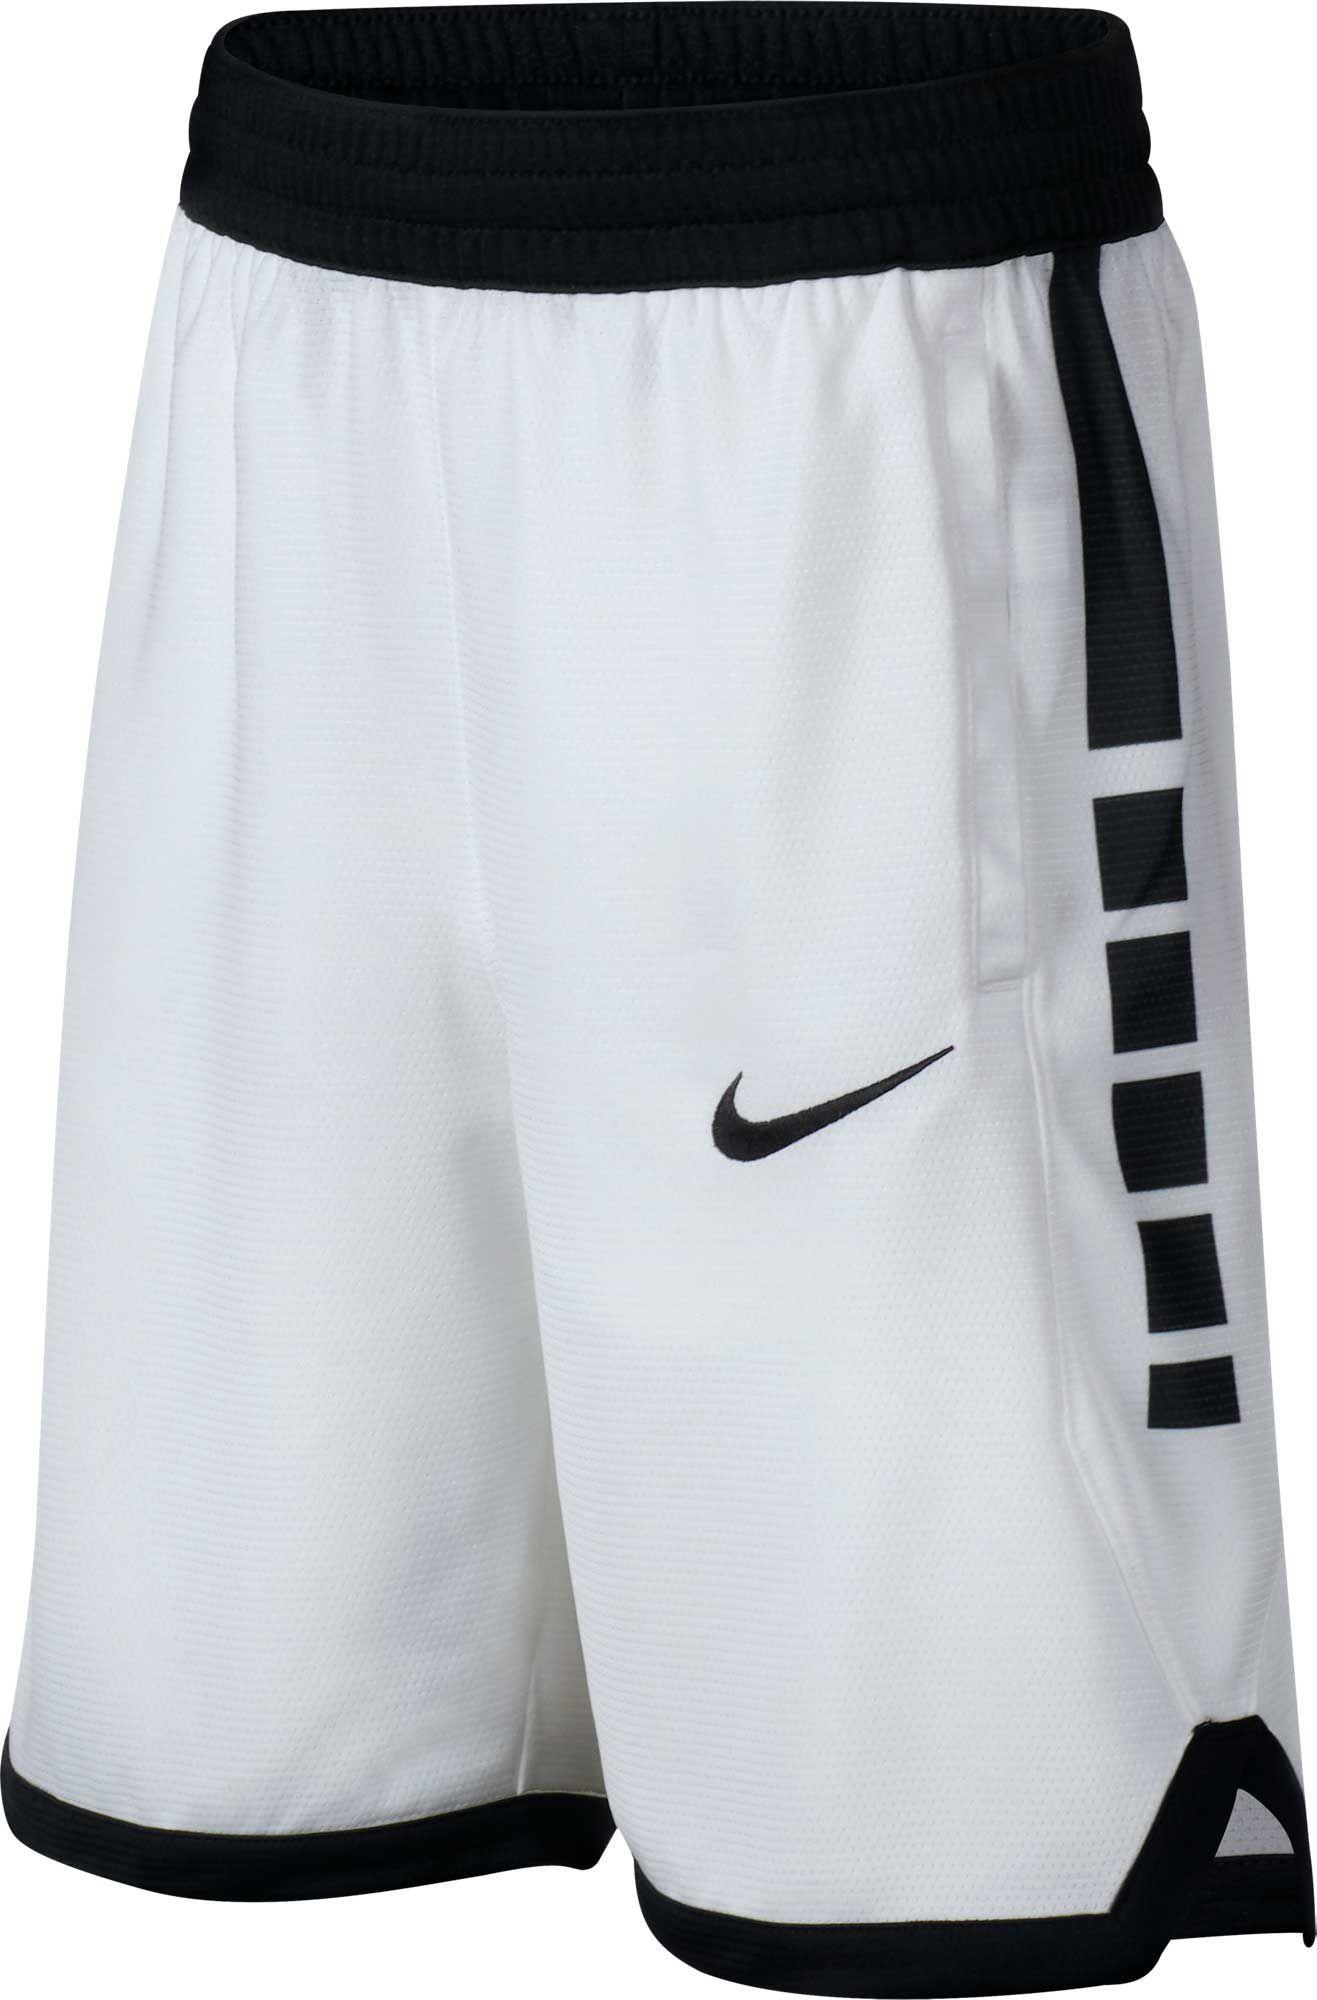 Nike Boys Dri Fit Elite Stripe Basketball Shorts Boy S Size Xs White In 2020 Basketball Shorts Girls Basketball Clothes Nike Basketball Shorts